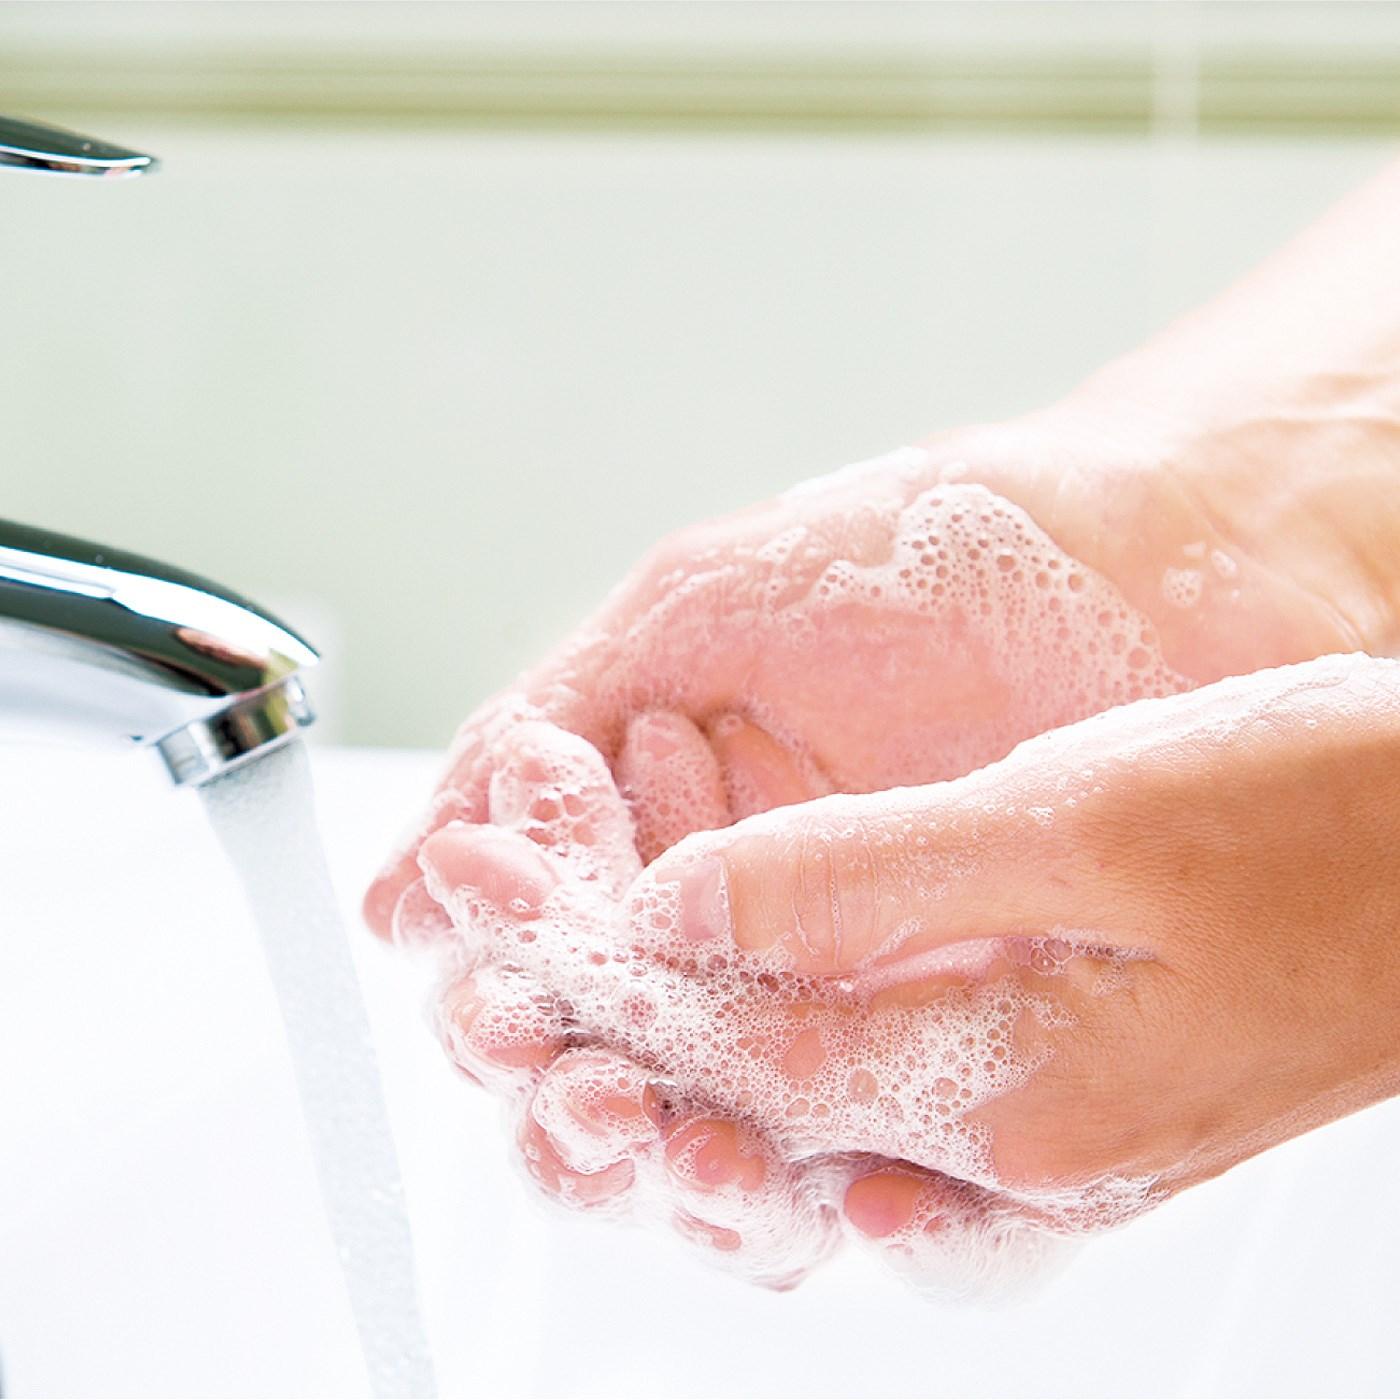 Kraso[クラソ] 携帯できるかわいいマイソープディスペンサー 泡にゃん 泡タイプのソープで手間なく手洗いOK!容量約6ml、約30回分使用可能。